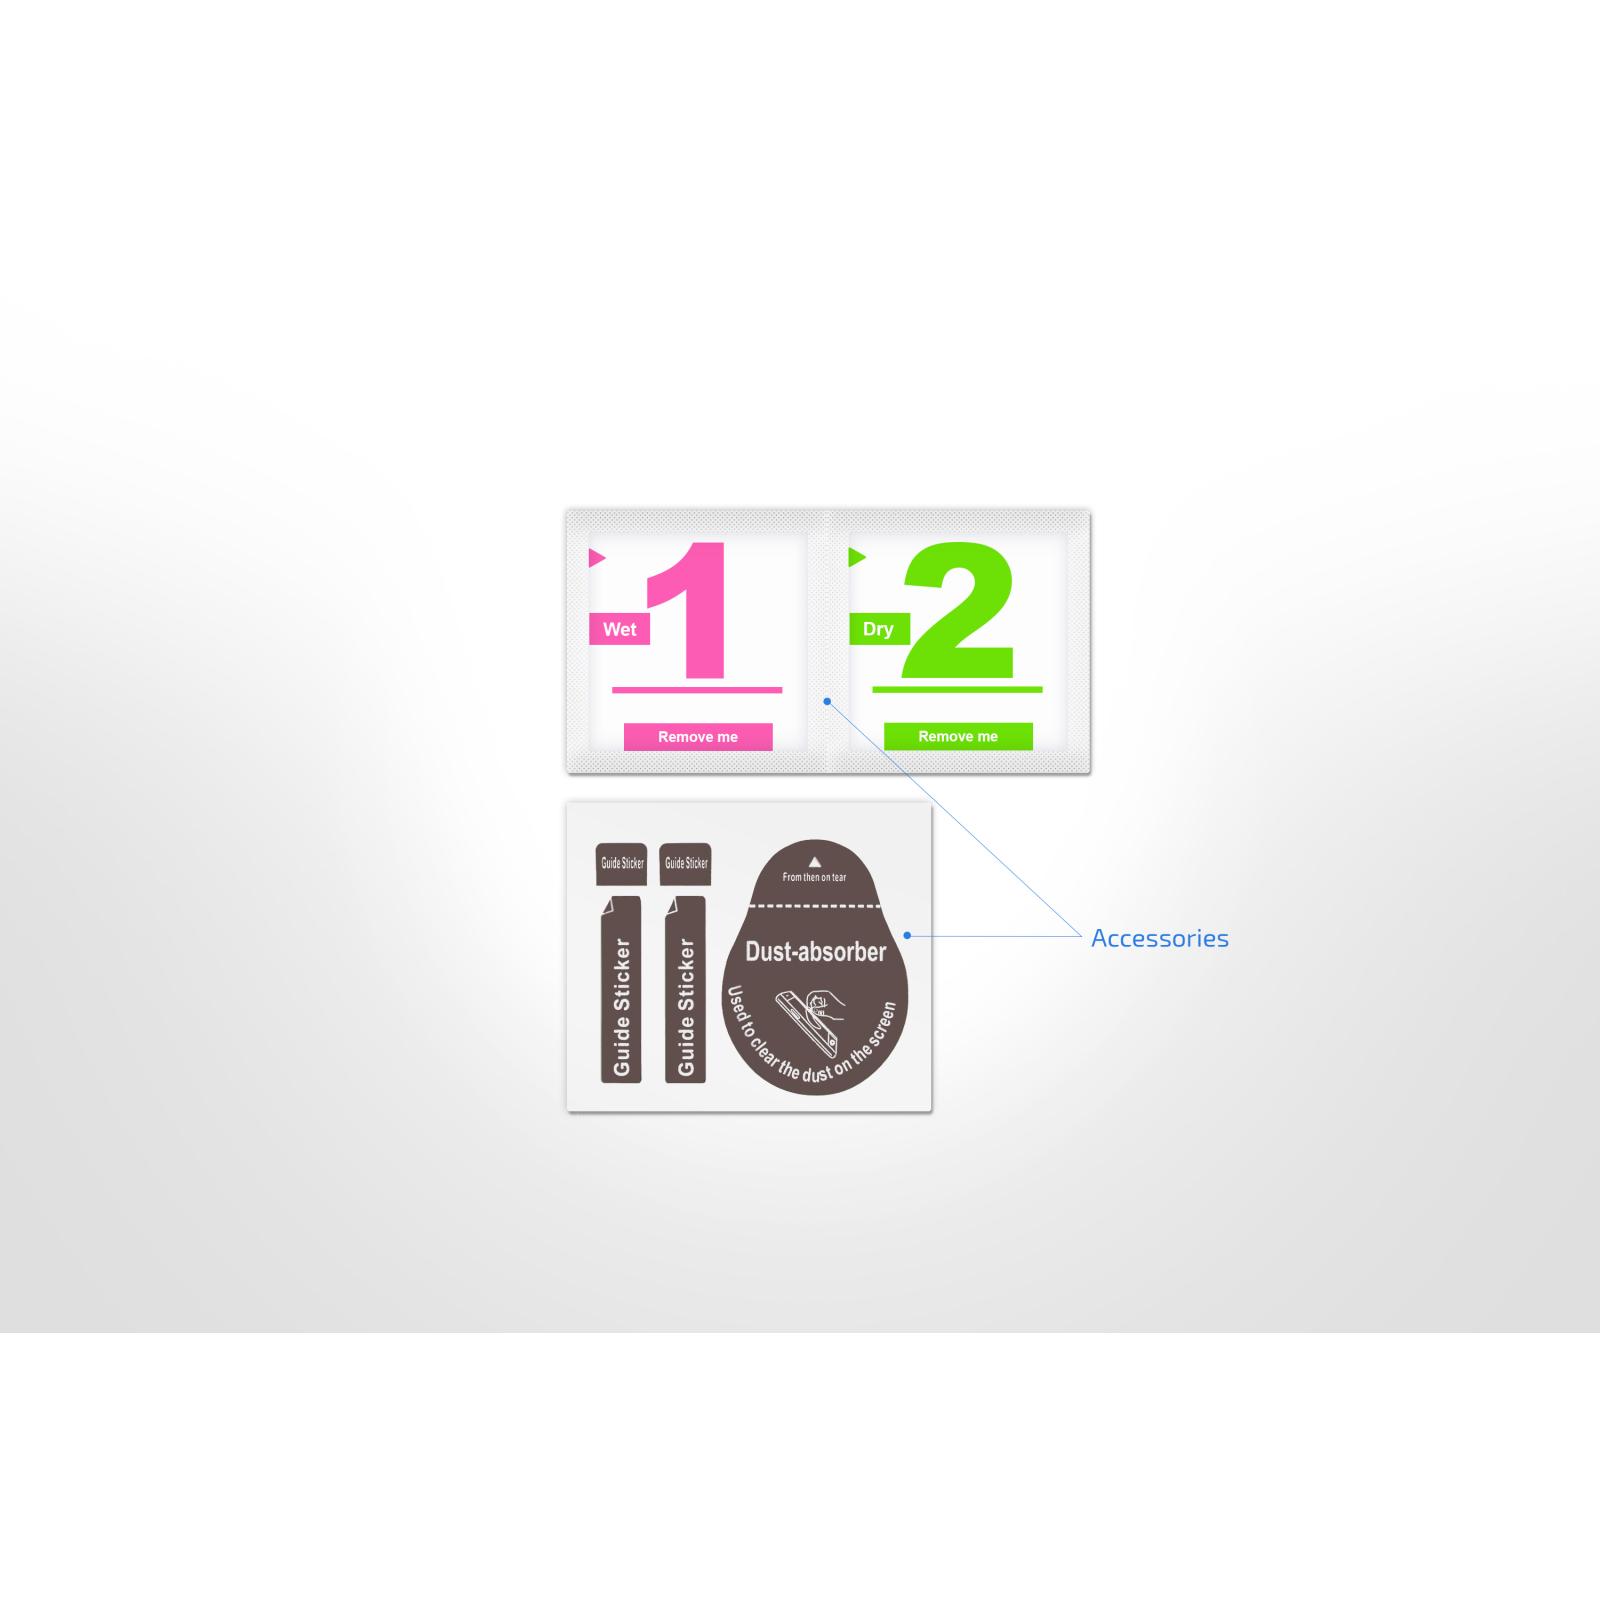 Стекло защитное 2E Xiaomi Mi Pad 4 WiFi / LTE, 2.5D, Clear (2E-MI-PAD4-LT25D-CL) изображение 4